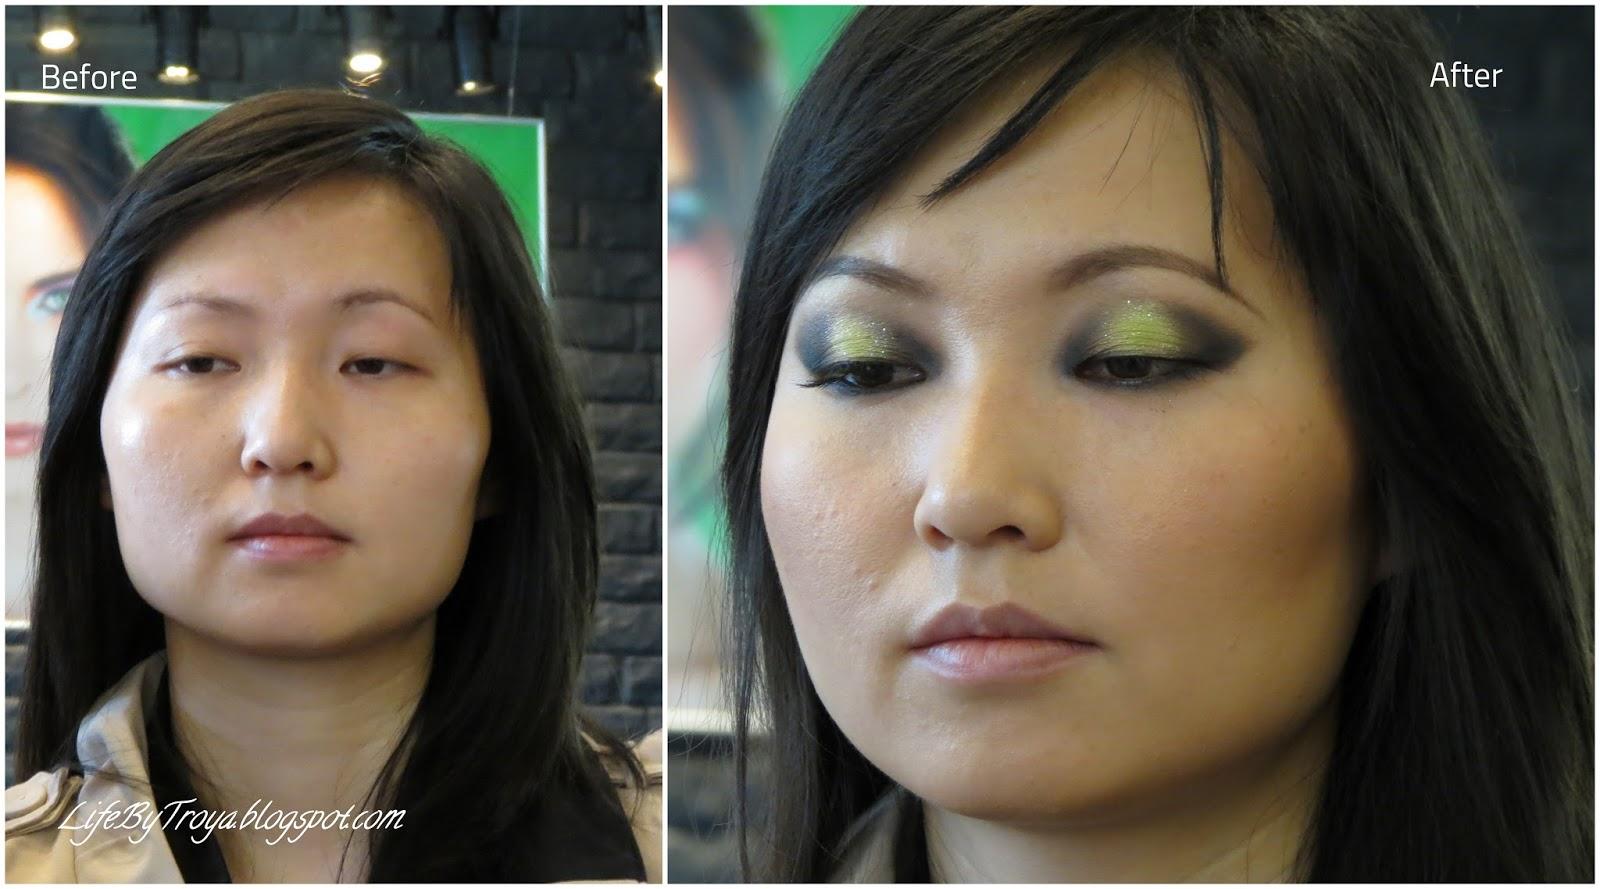 Фото макияжа азиатского типа